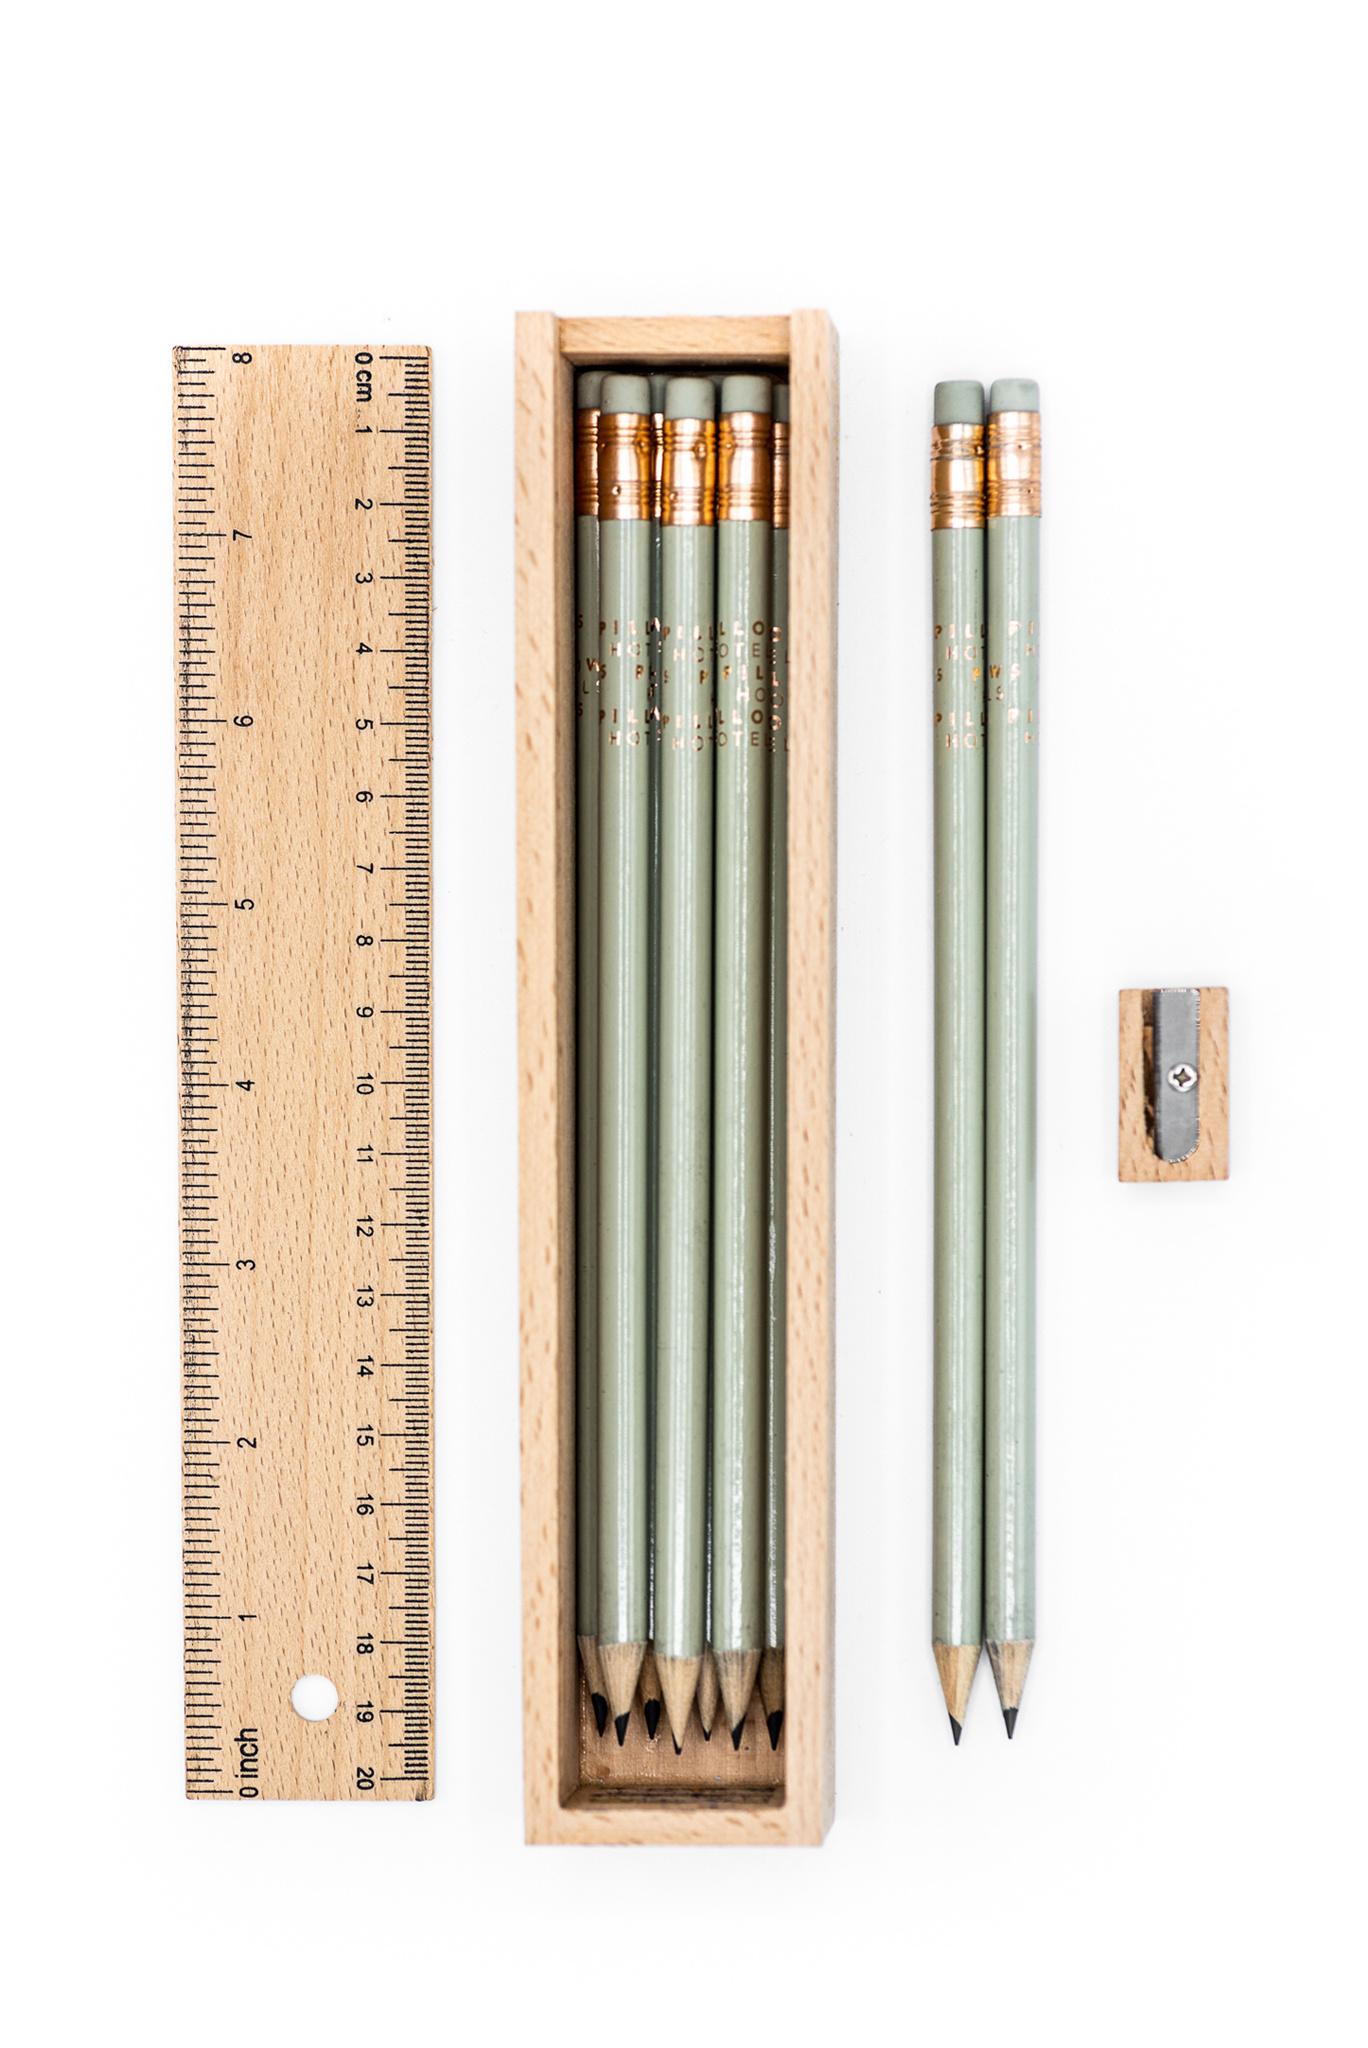 Pencil and pencil box